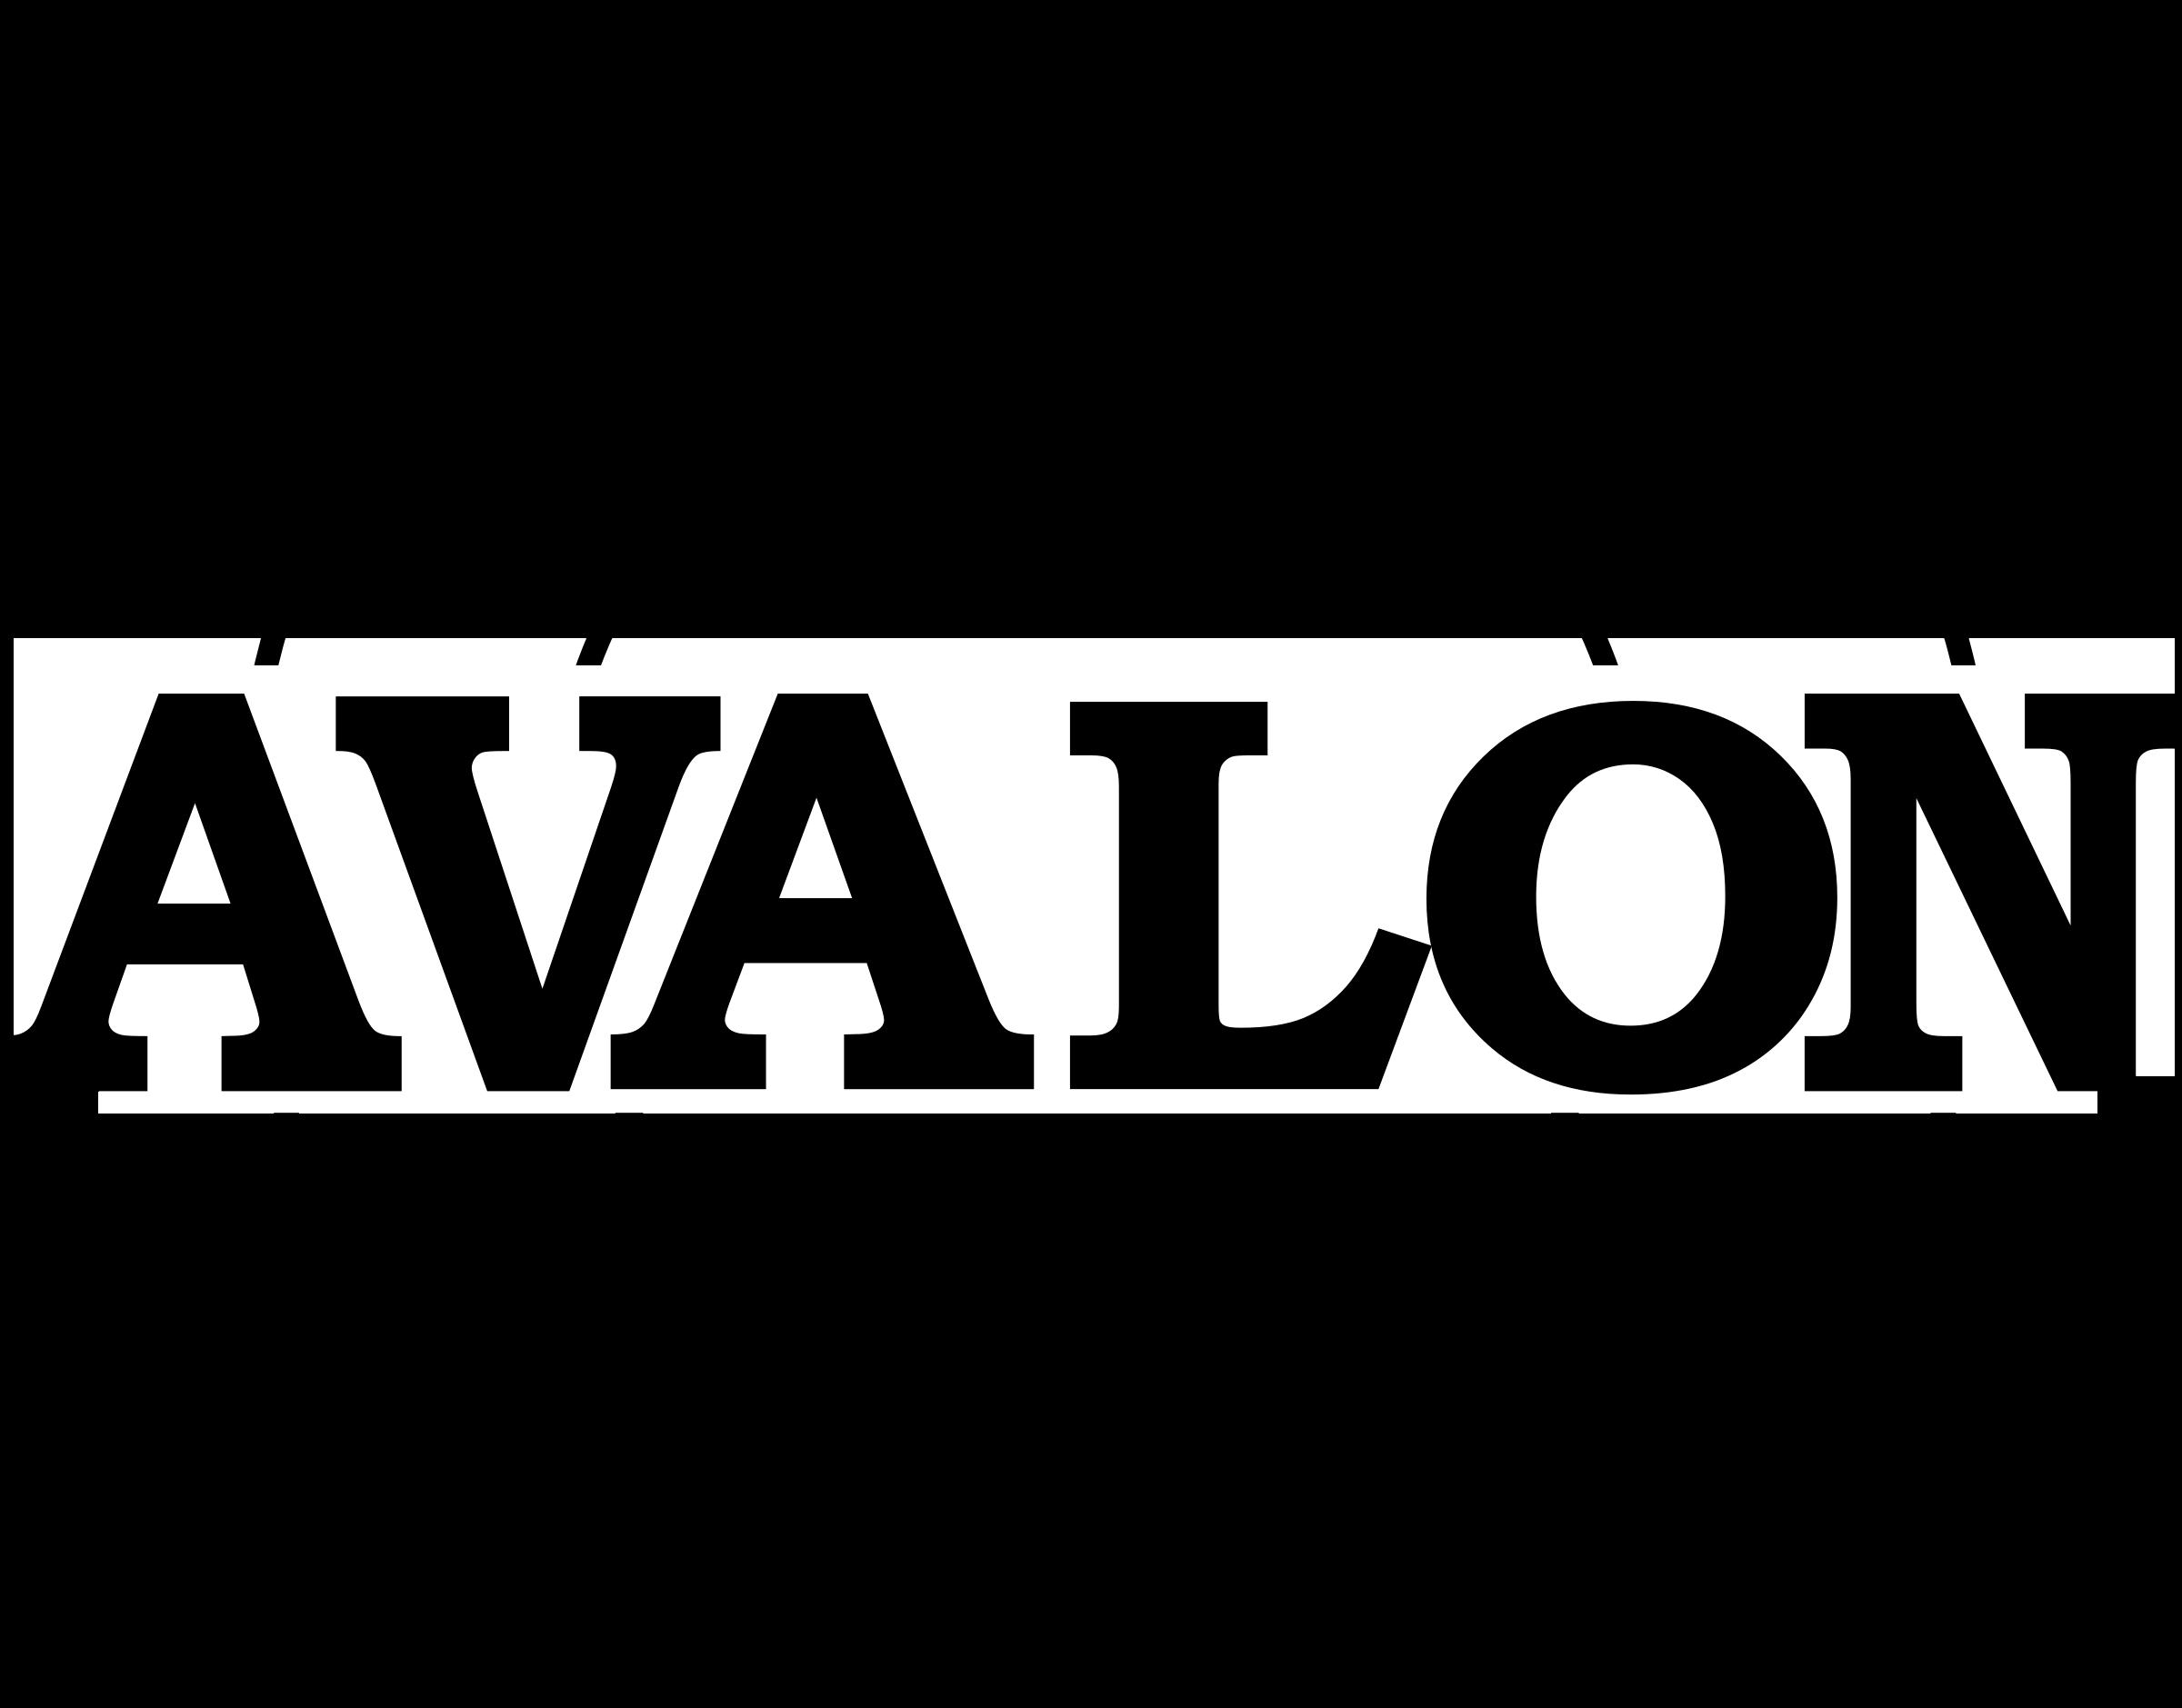 Avalon Logo PNG Transparent & SVG Vector.